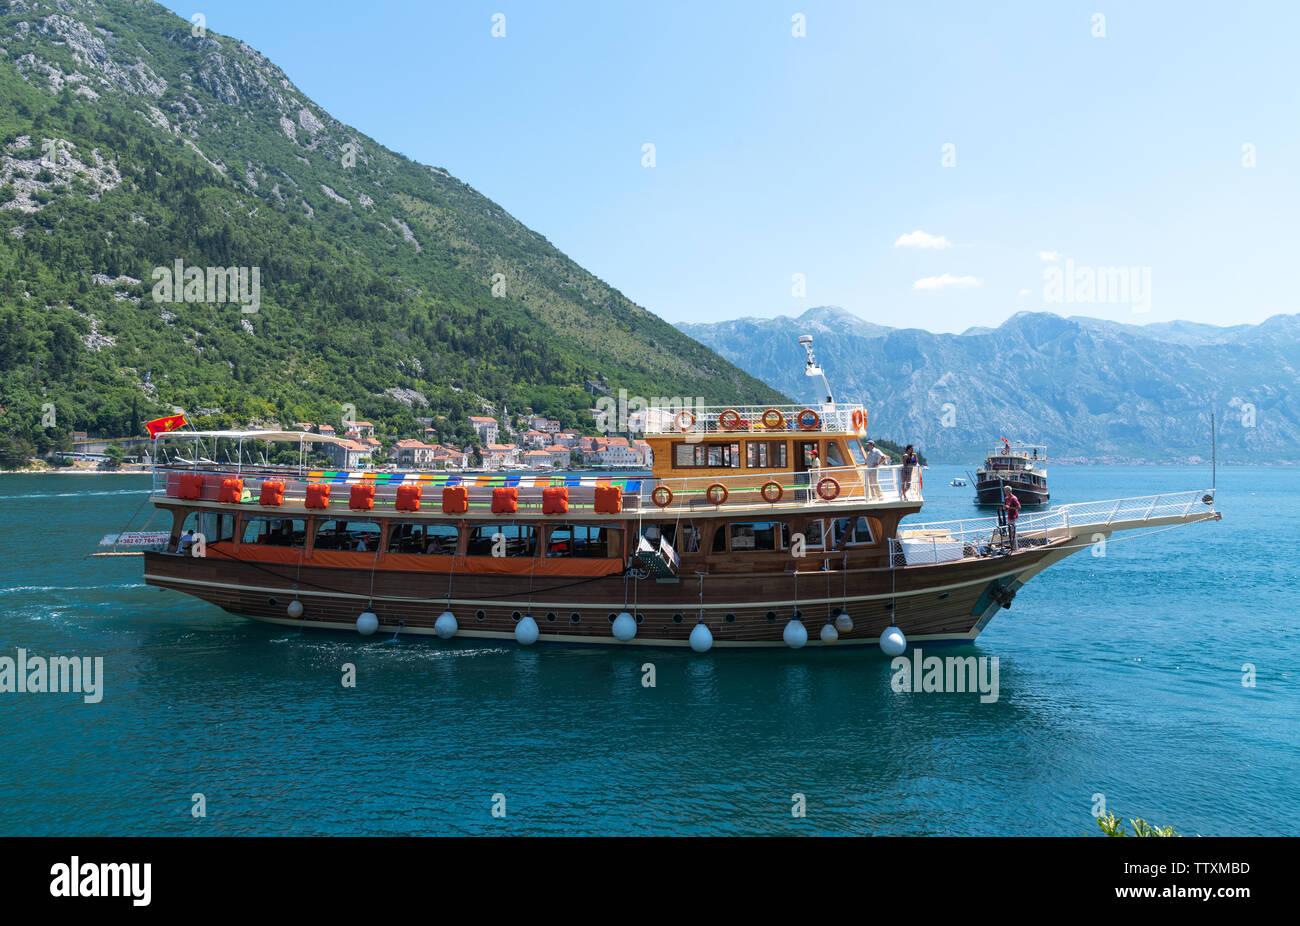 Perast, Montenegro - June 10. 2019. Beautiful excursion boat in a Boka-Kotorska bay - Stock Image